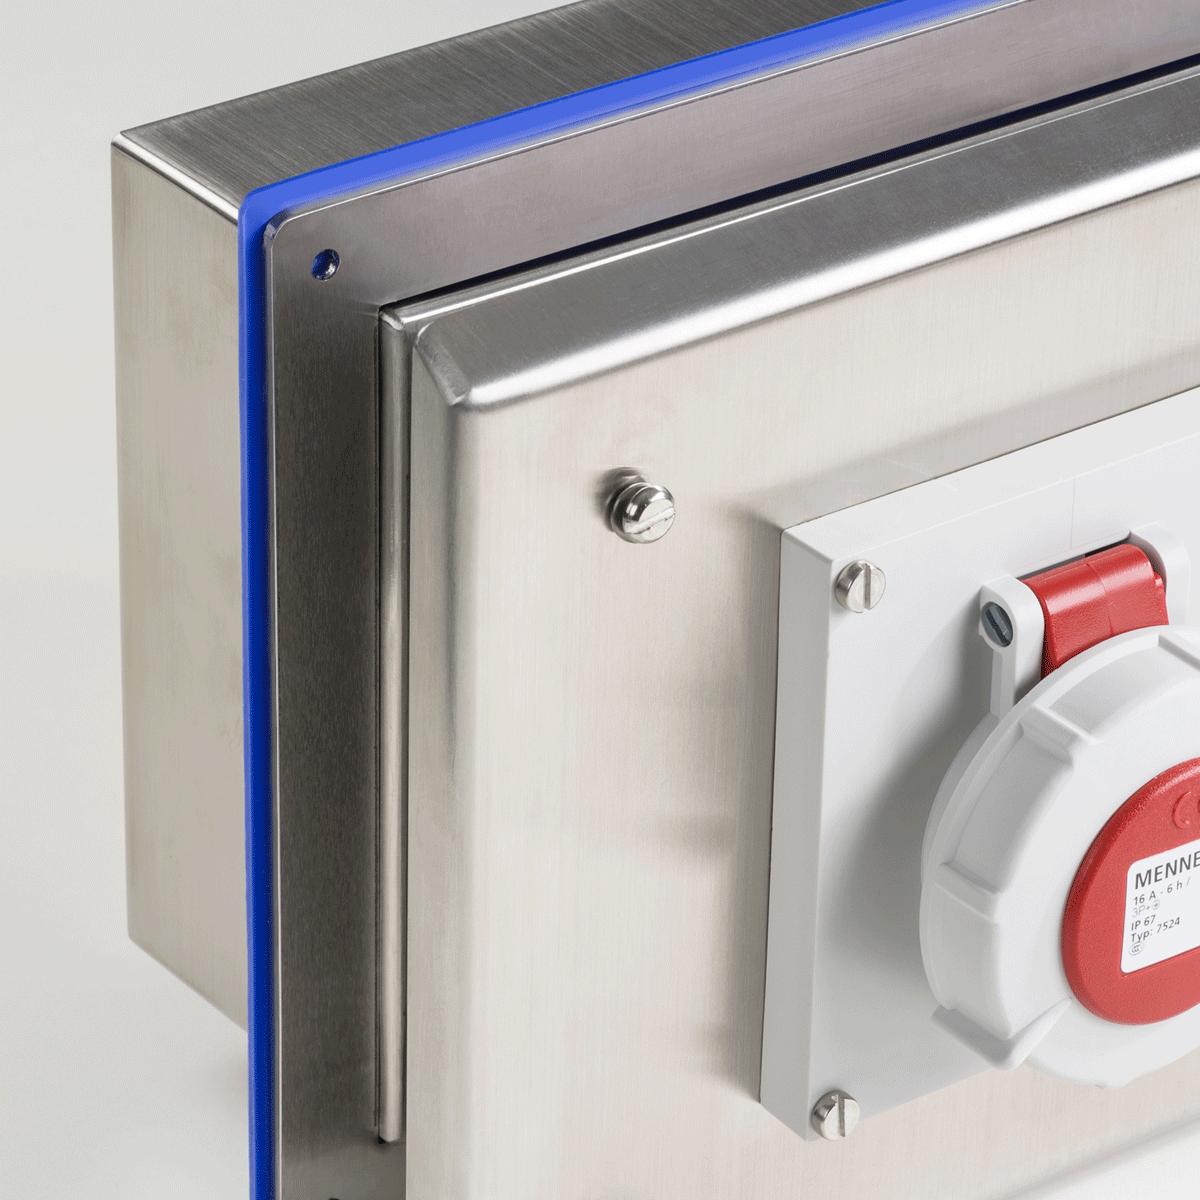 Sku: ph-soc-a s316 flush mounted pharma interlocked switch & socket enclosure